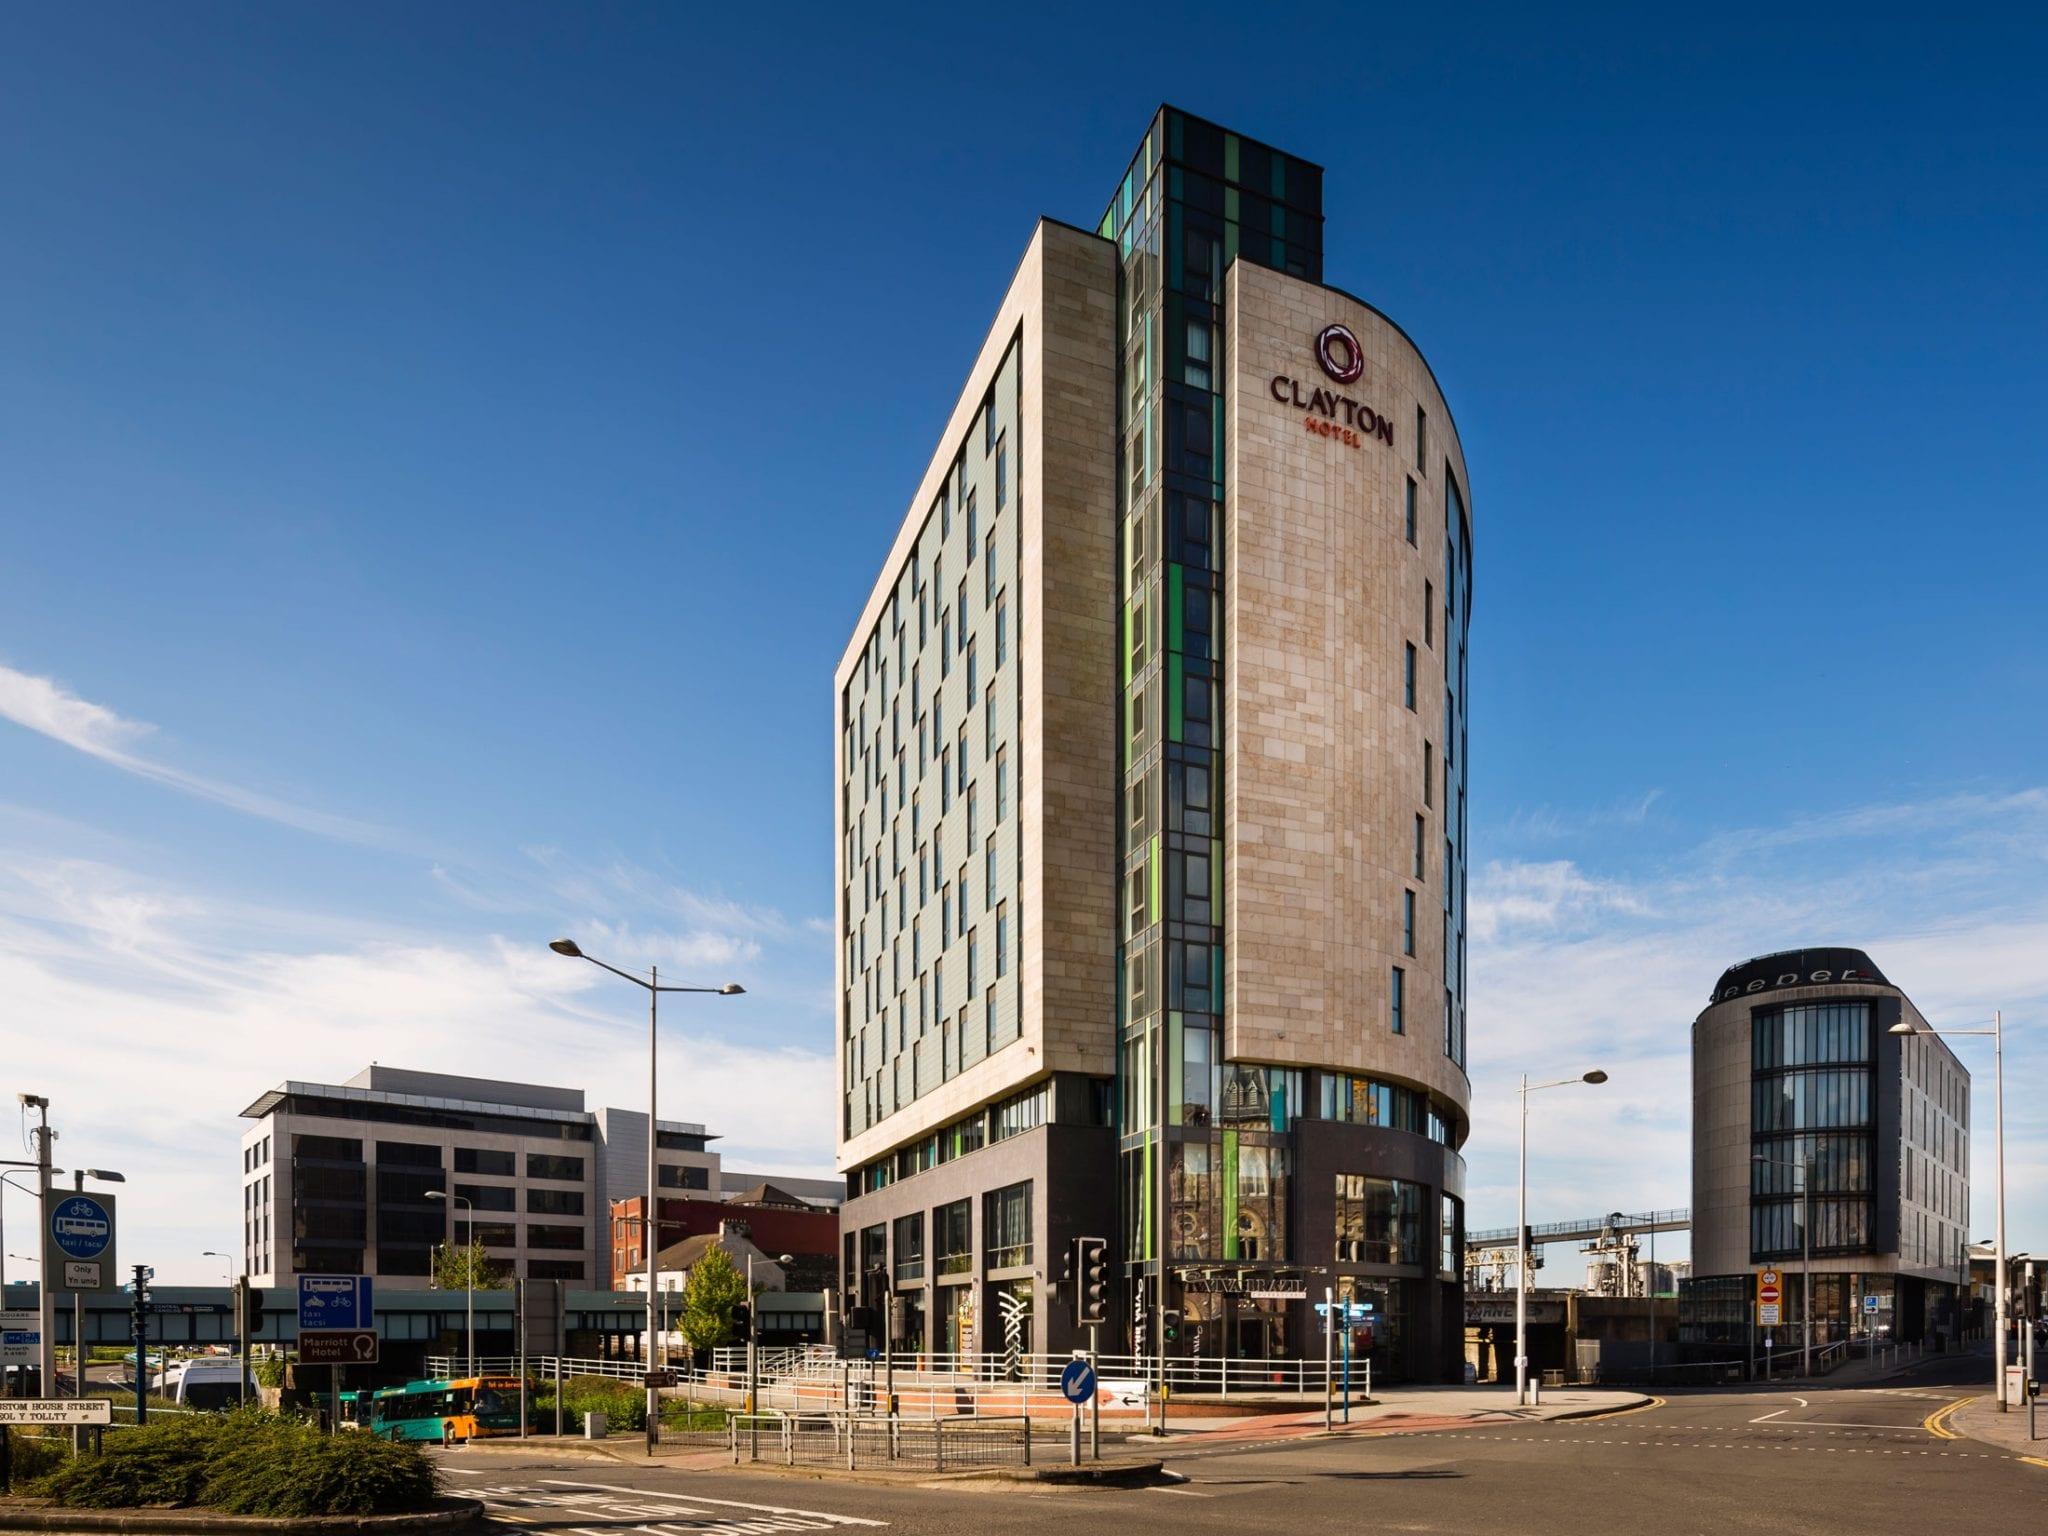 Hotel Exterior: 4 Star Clayton Hotel Cardiff